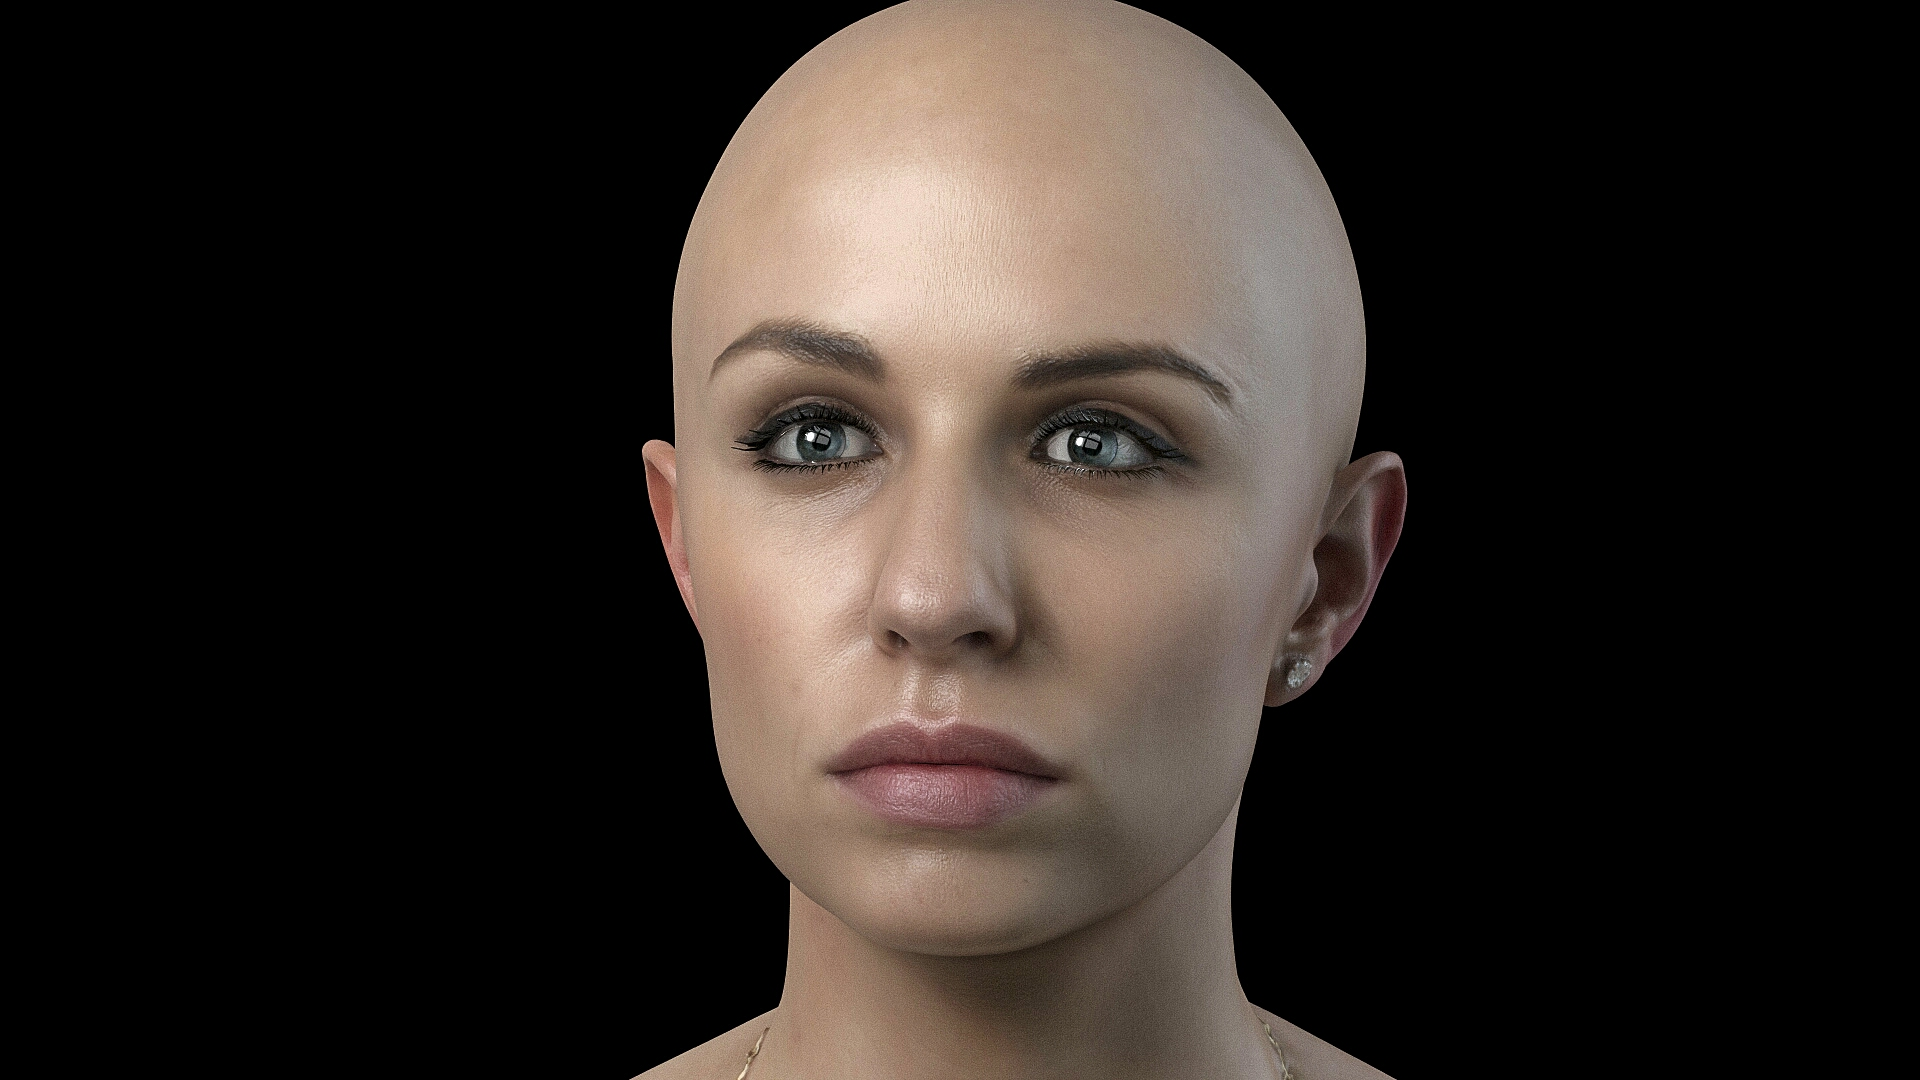 Digital Skin